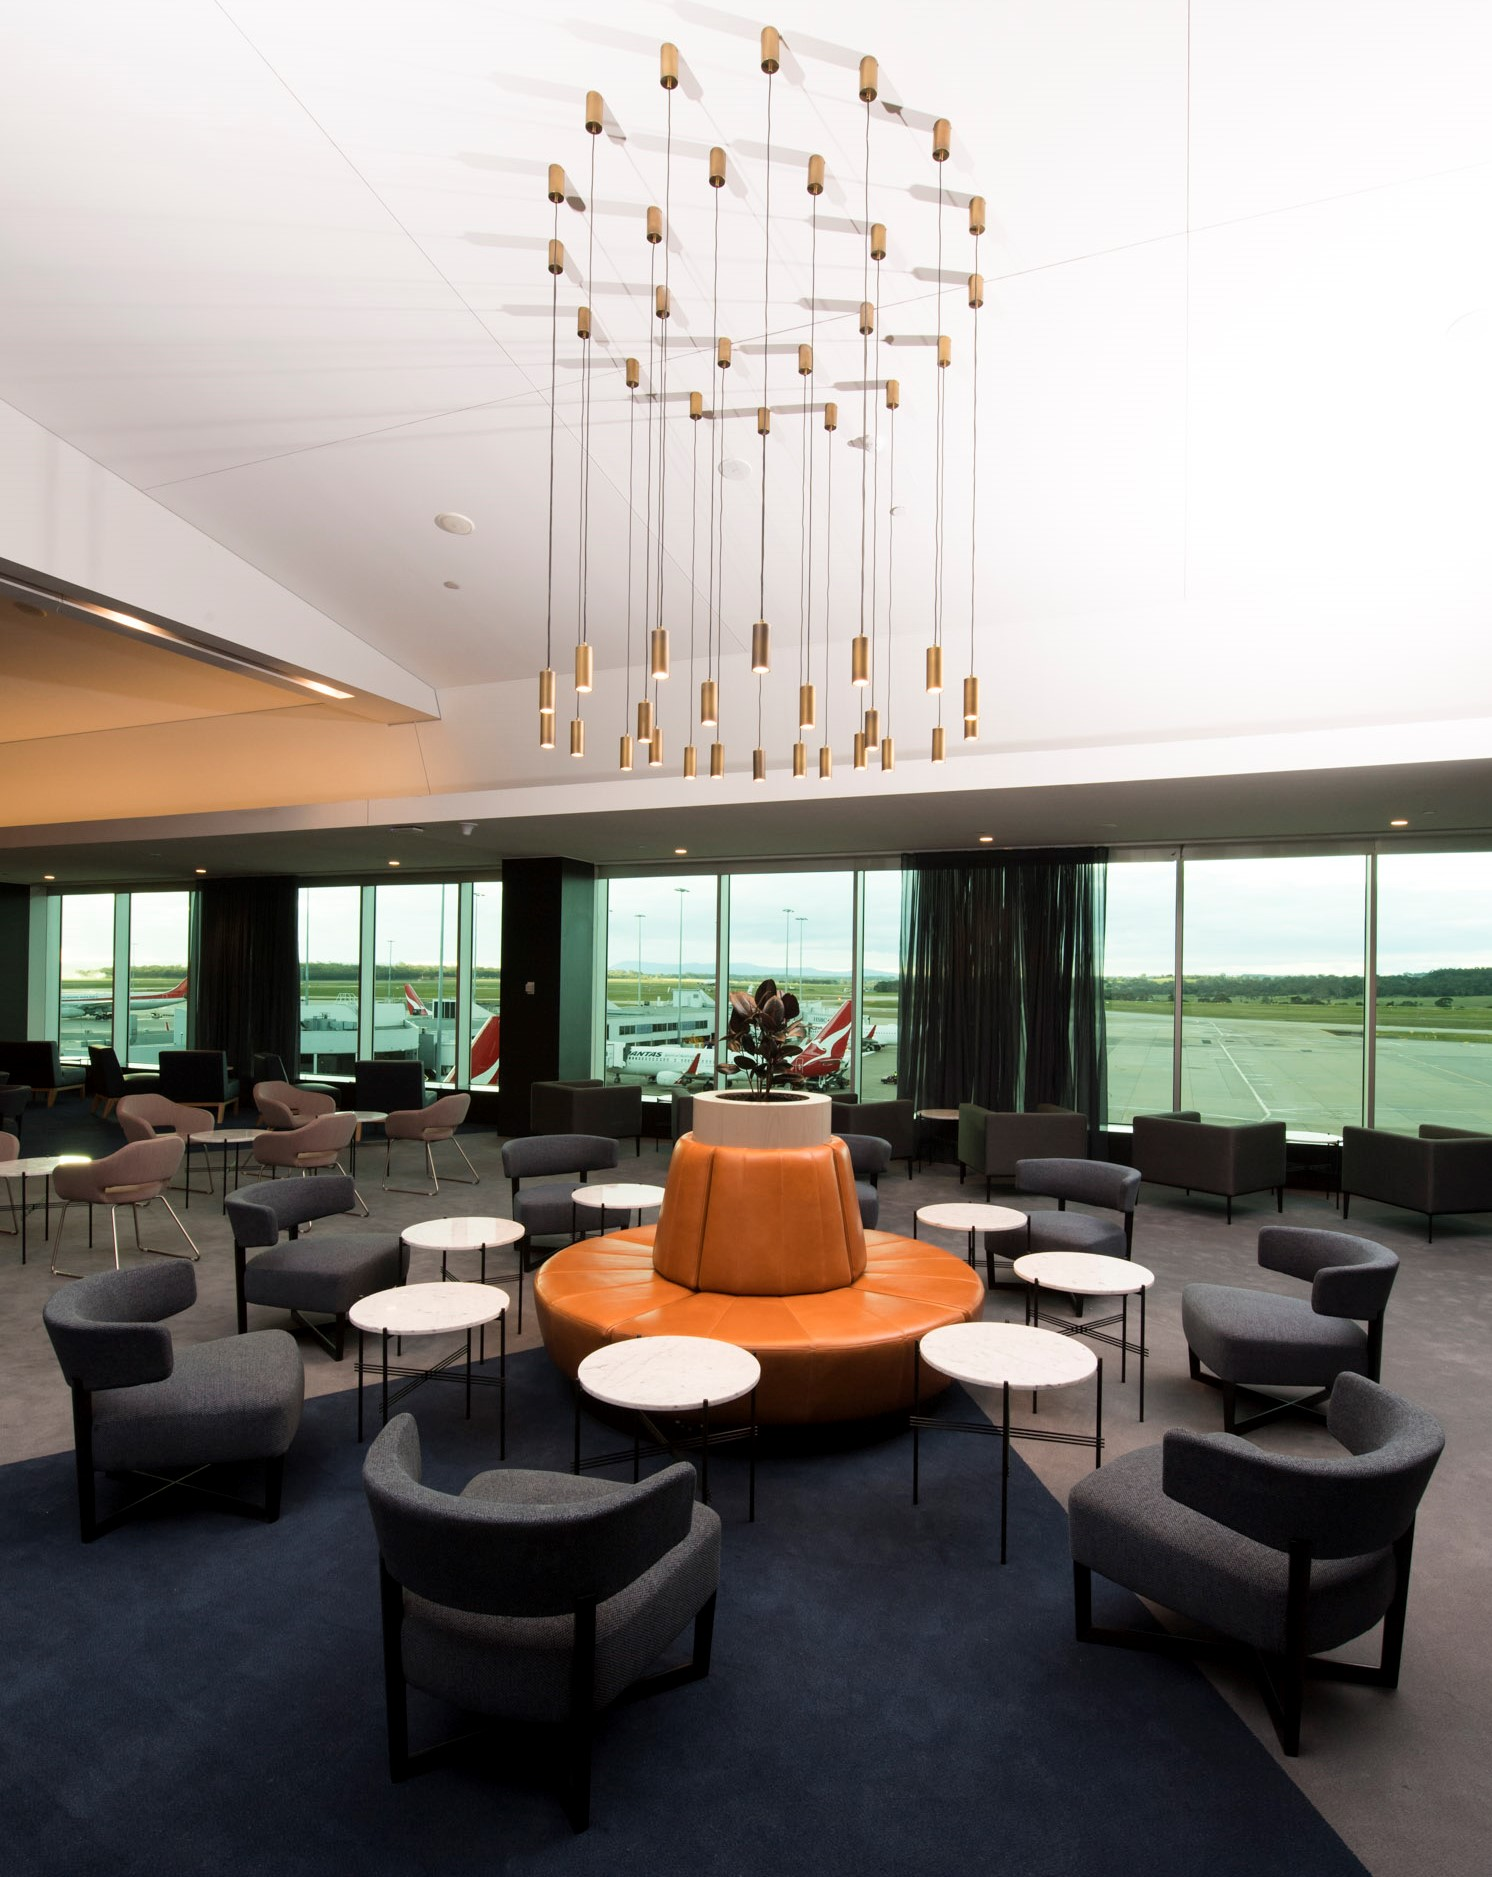 Melbourne Domestic Business Lounge